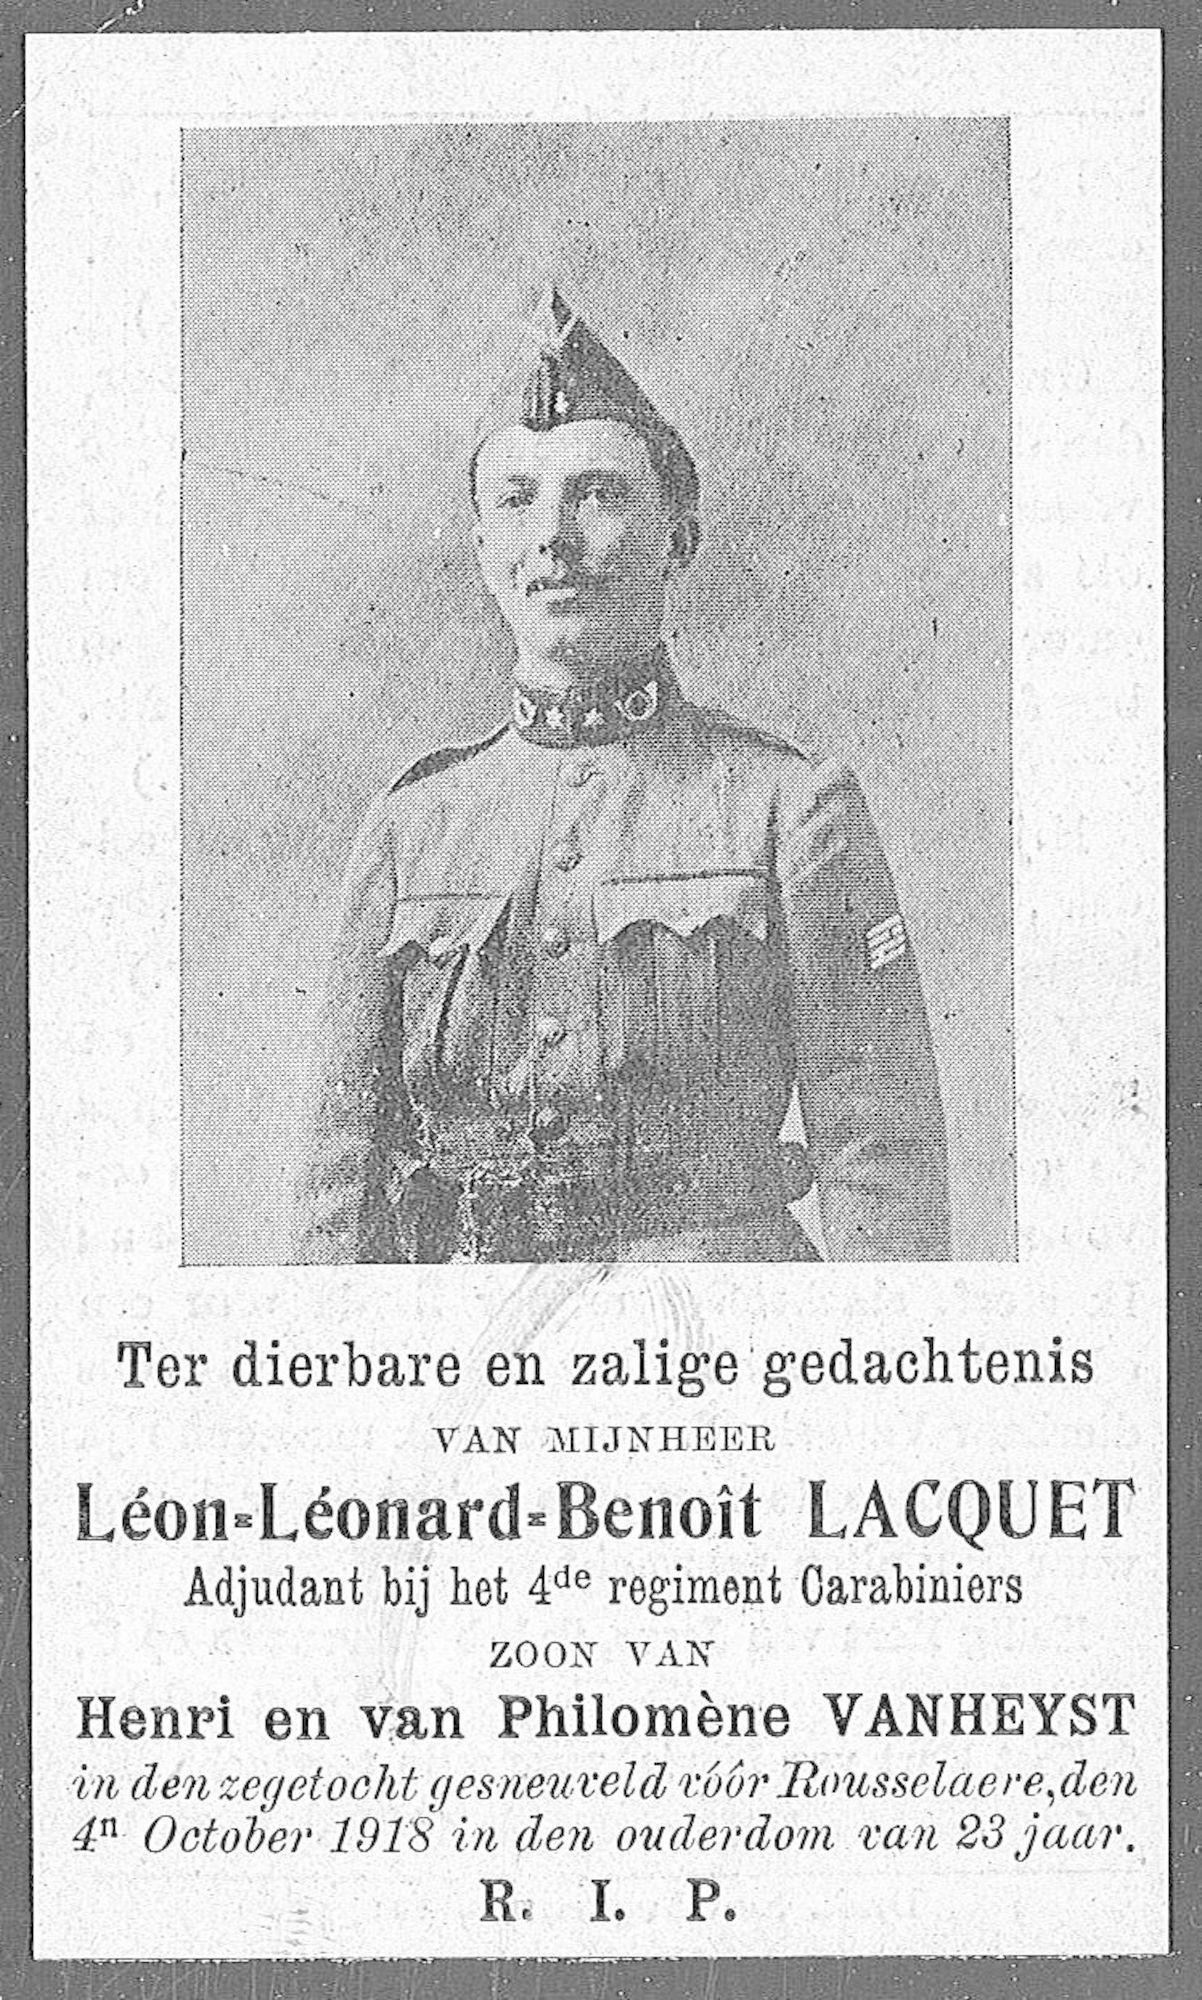 Lacquet Léon-Léonard-Benoit